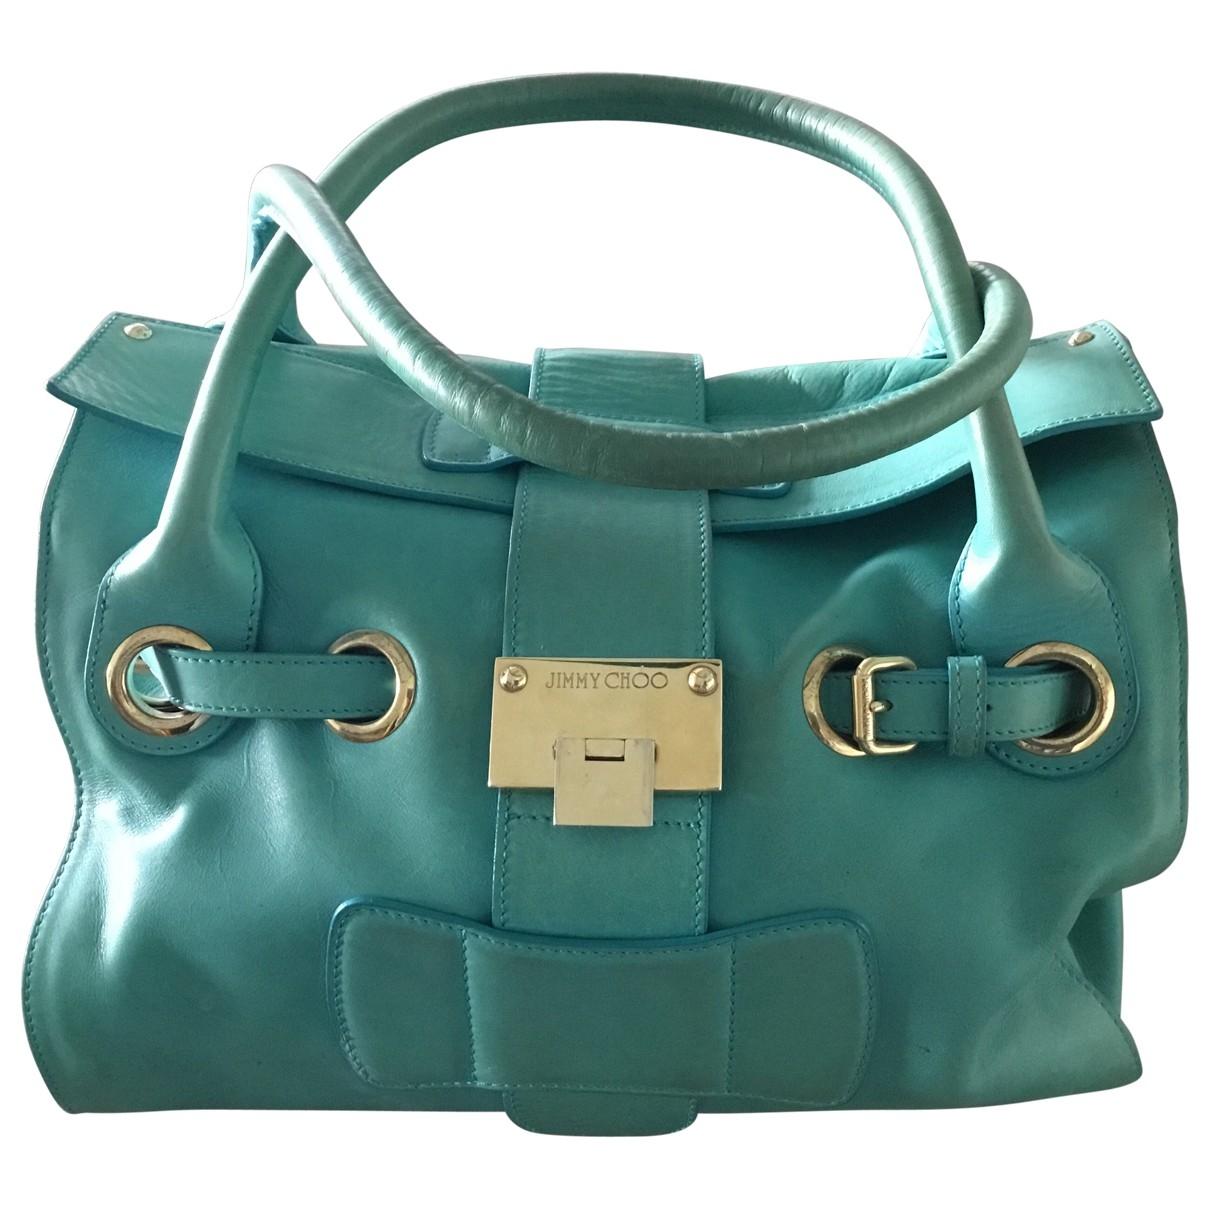 Jimmy Choo \N Turquoise Leather handbag for Women \N